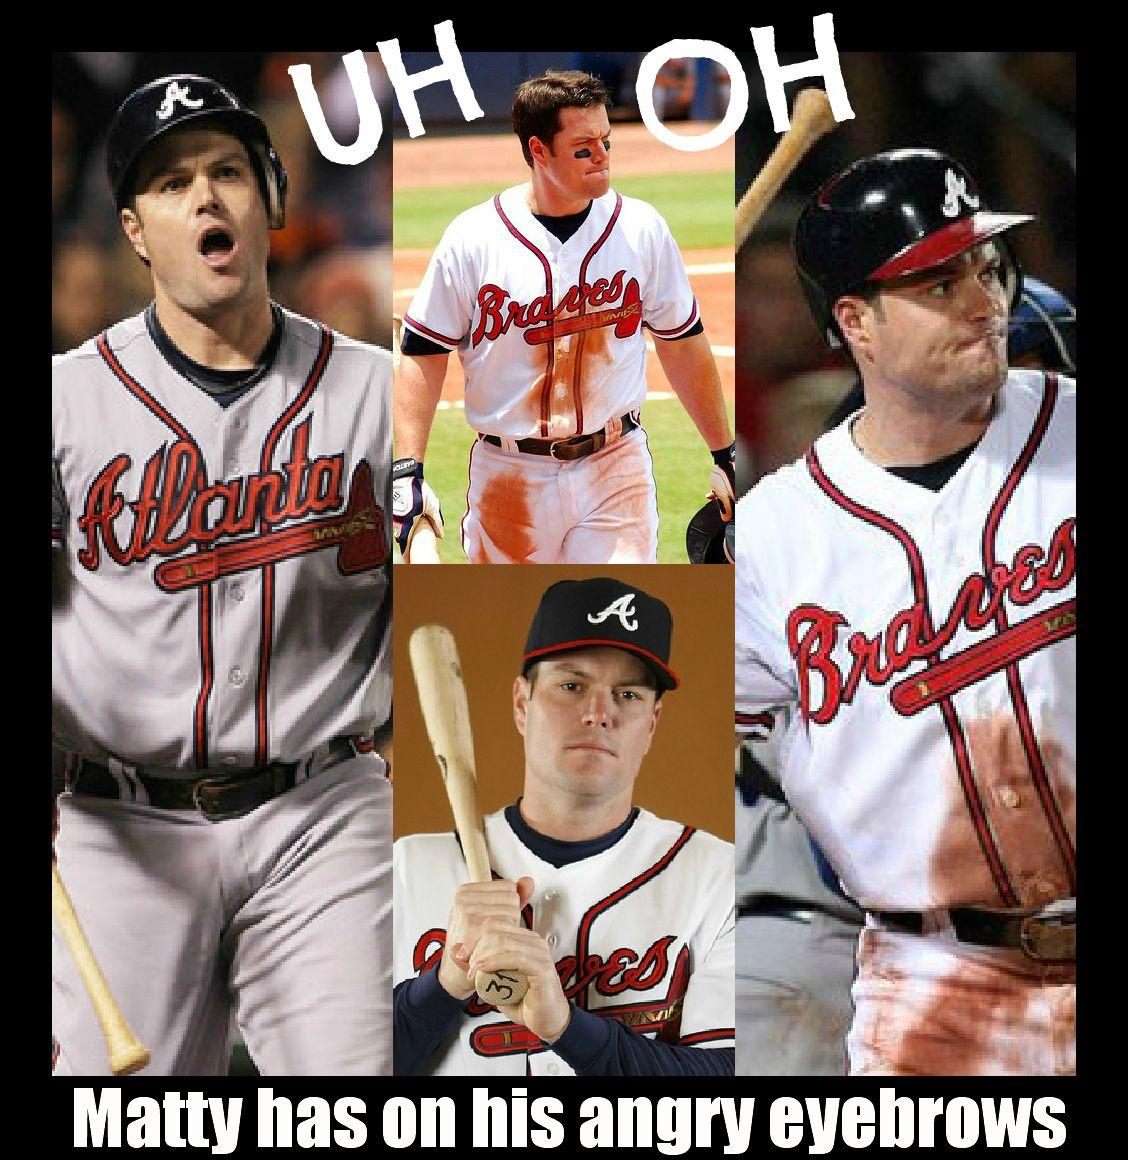 Like A Boss With Images Braves American Baseball League Atlanta Braves